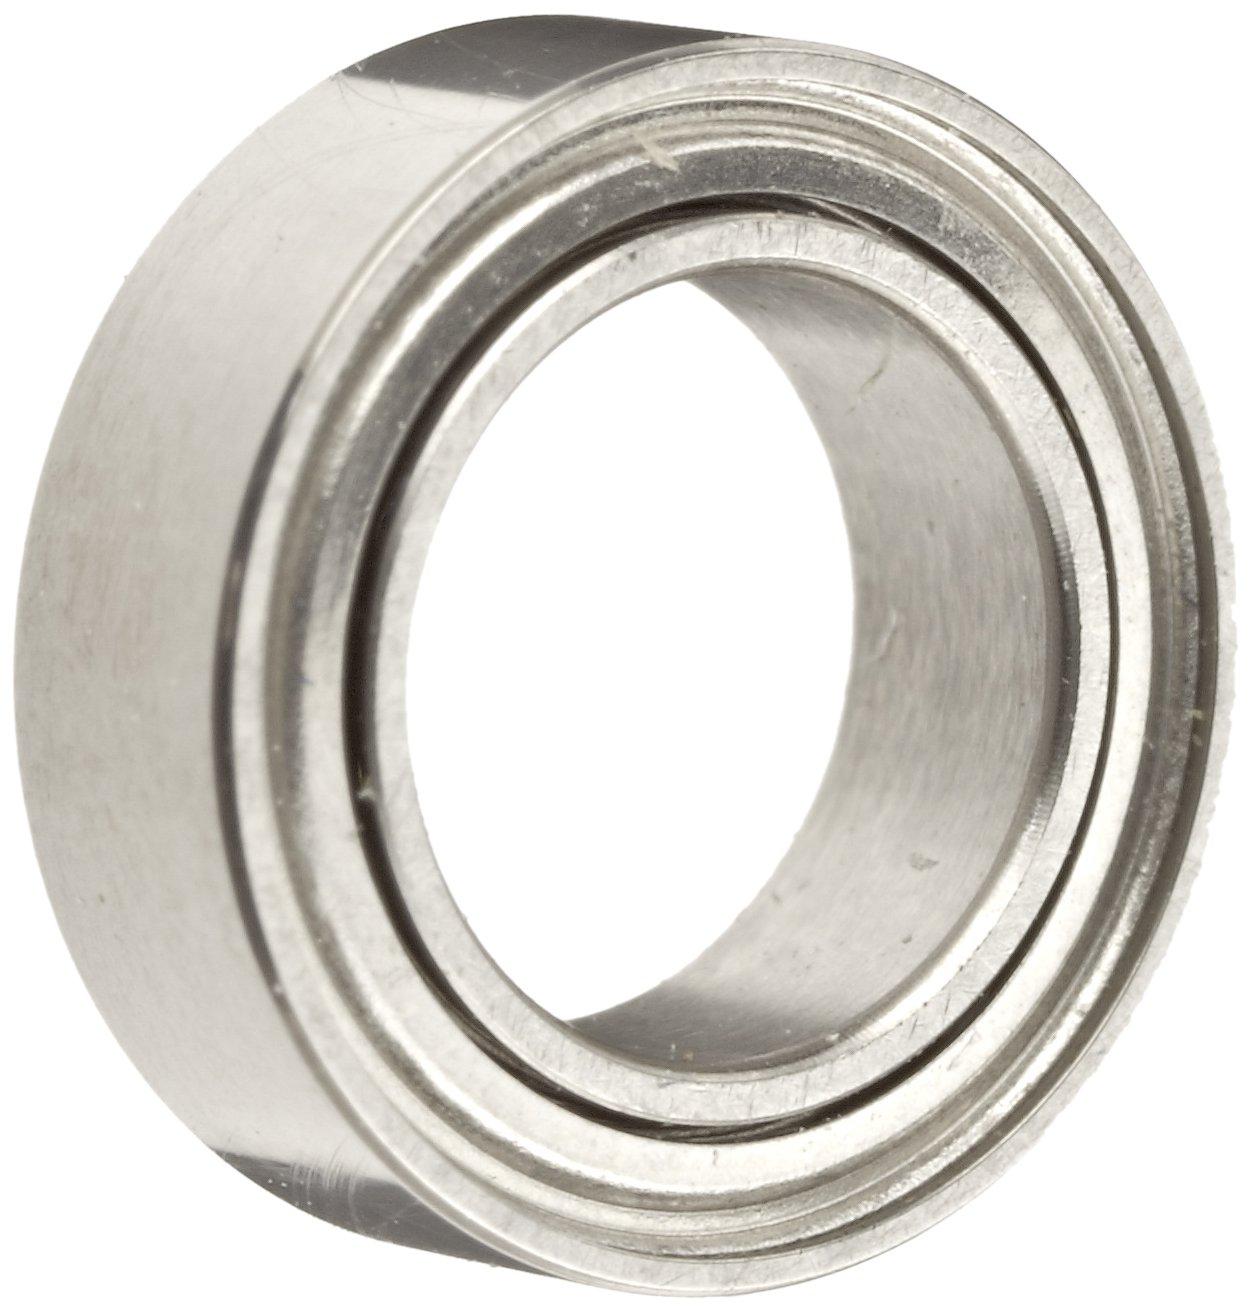 250 1mm Diameter Chrome Steel G25 Deep Groove Radial Ball Bearings